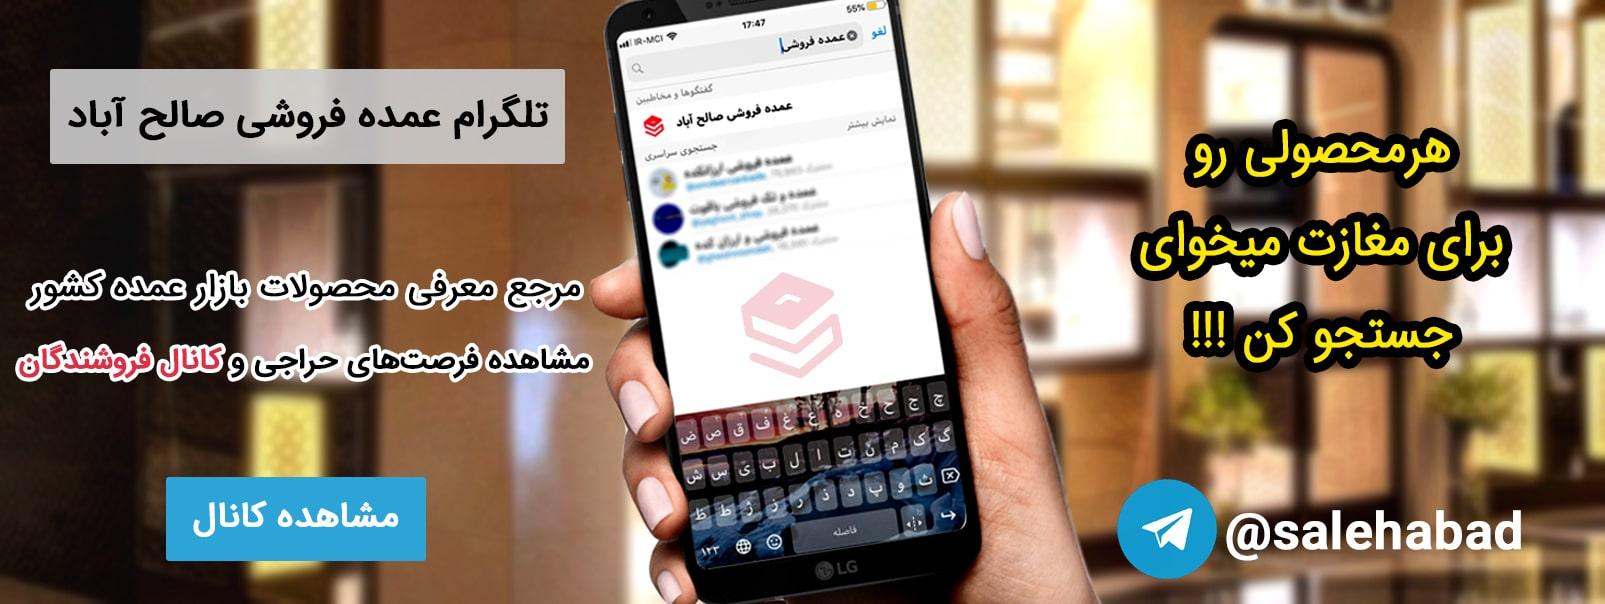 کانال تلگرام صالح آباد